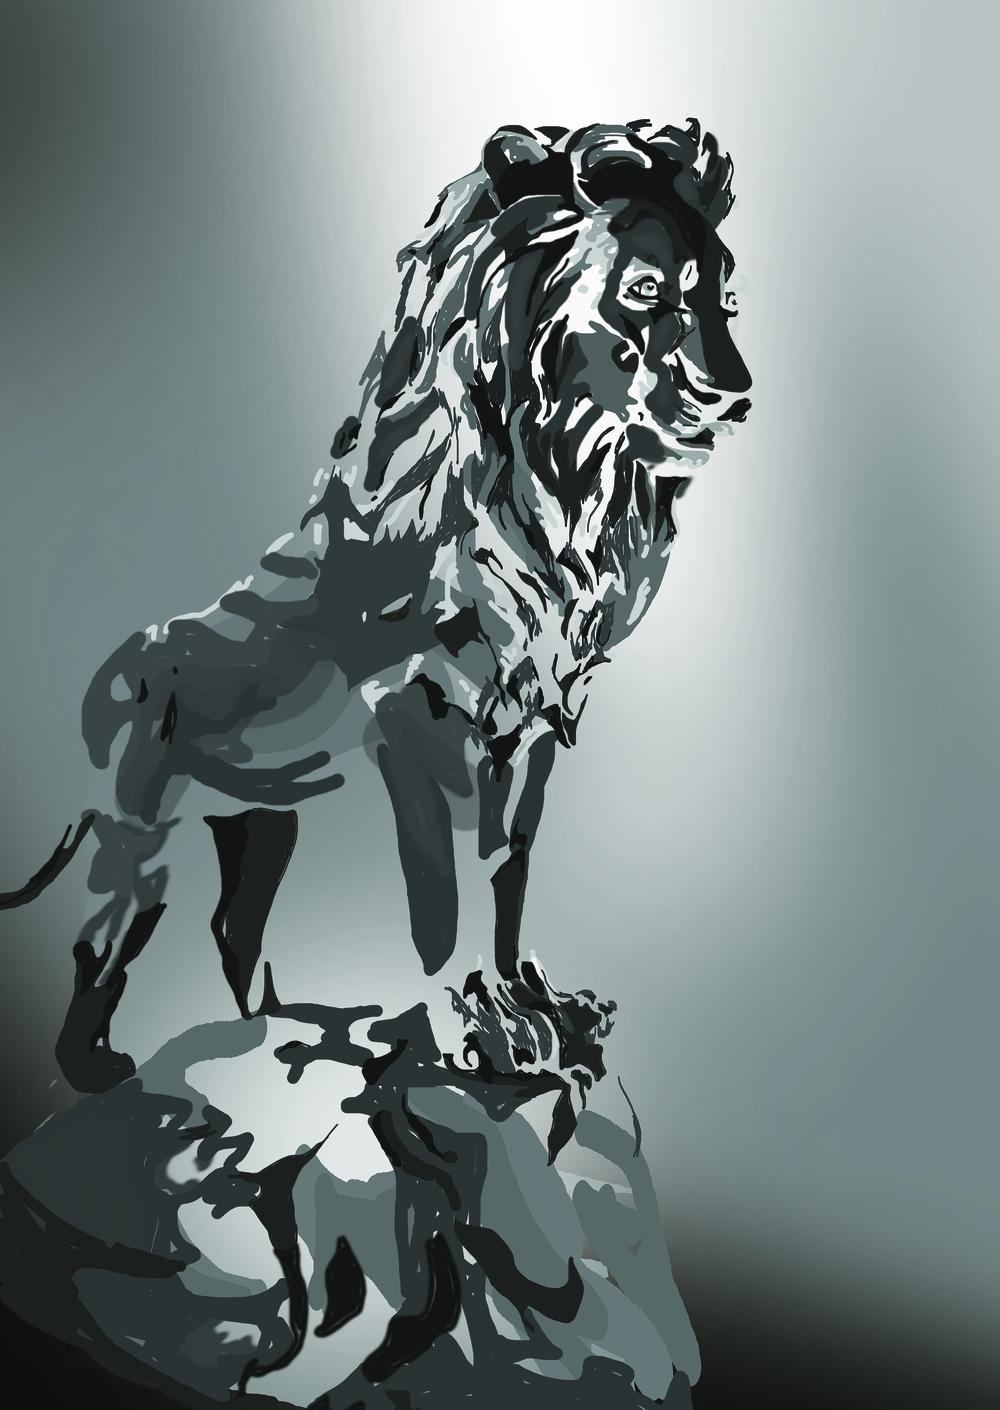 ART140 Digital Photography - Digital Illustration: Inhui Lee